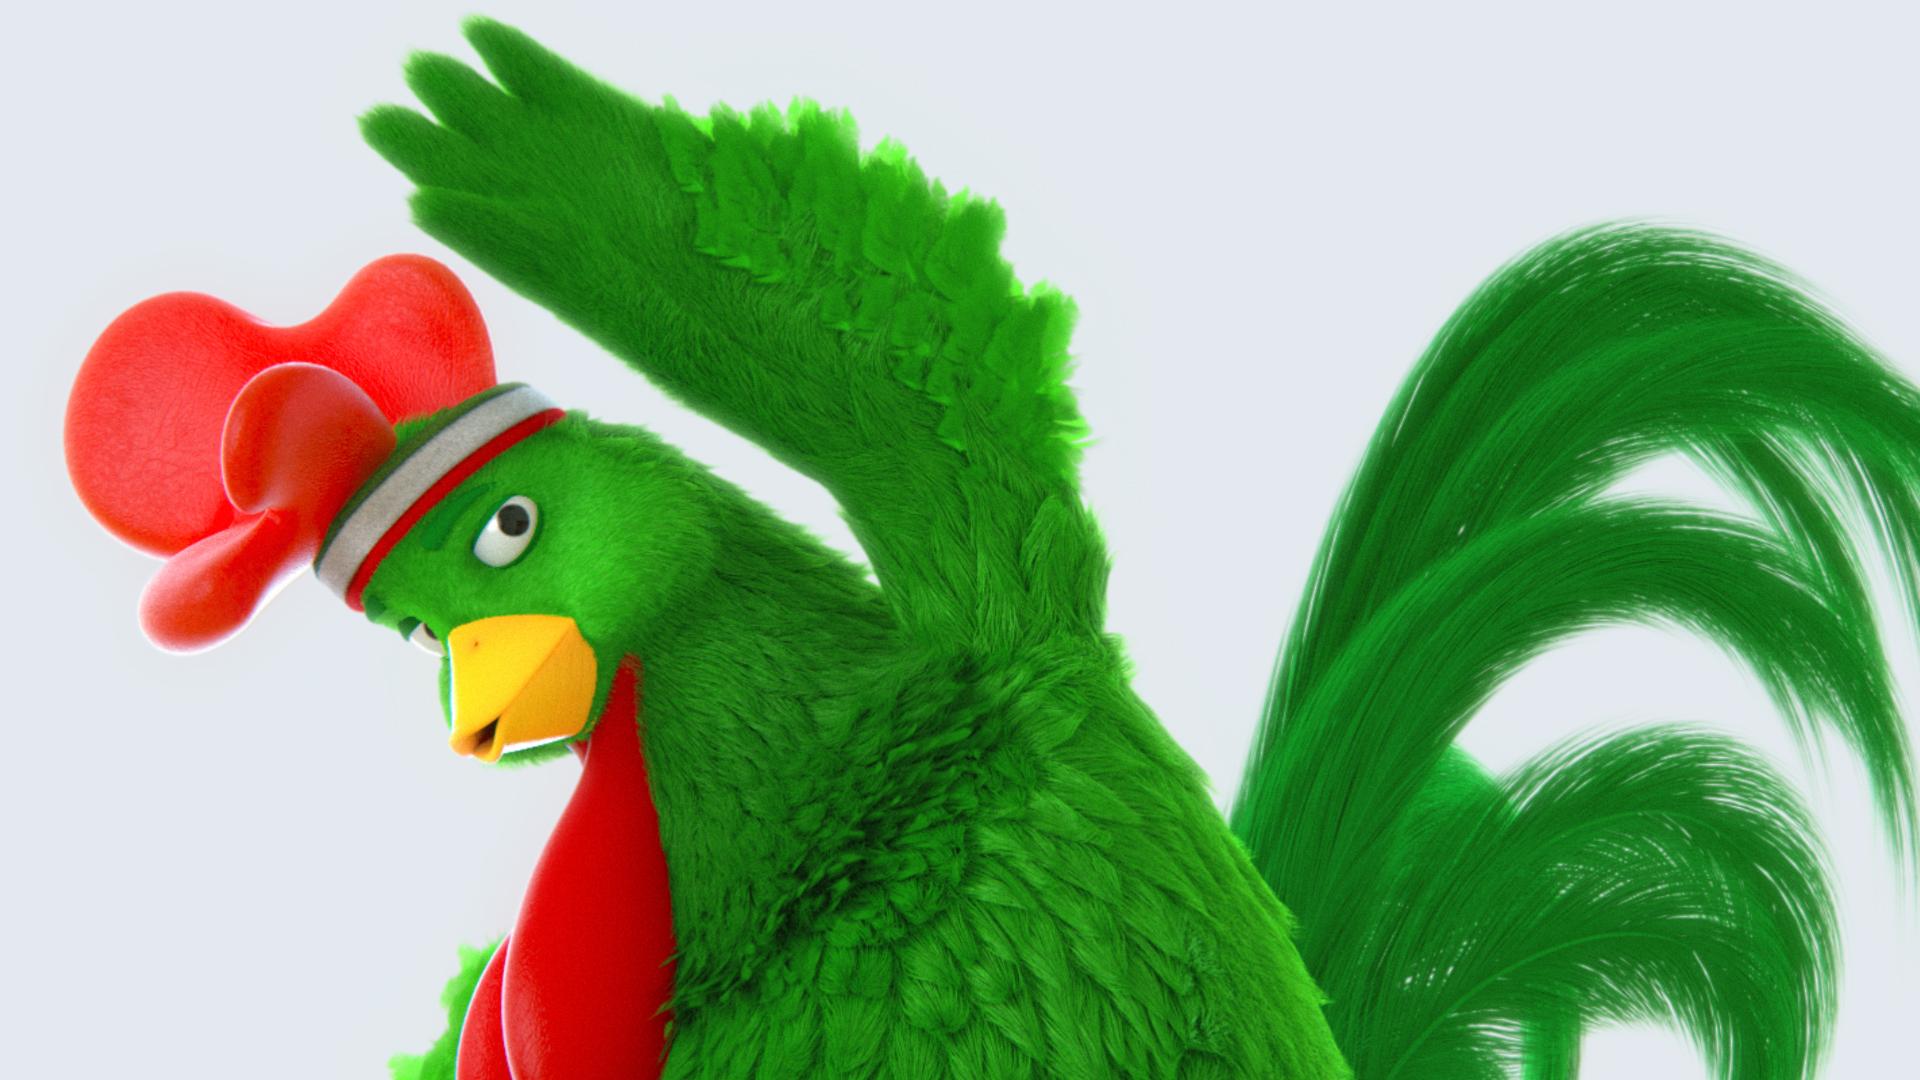 riso_gallo_armando_testa_taxfreefilm_animation_commercial_03.jpg